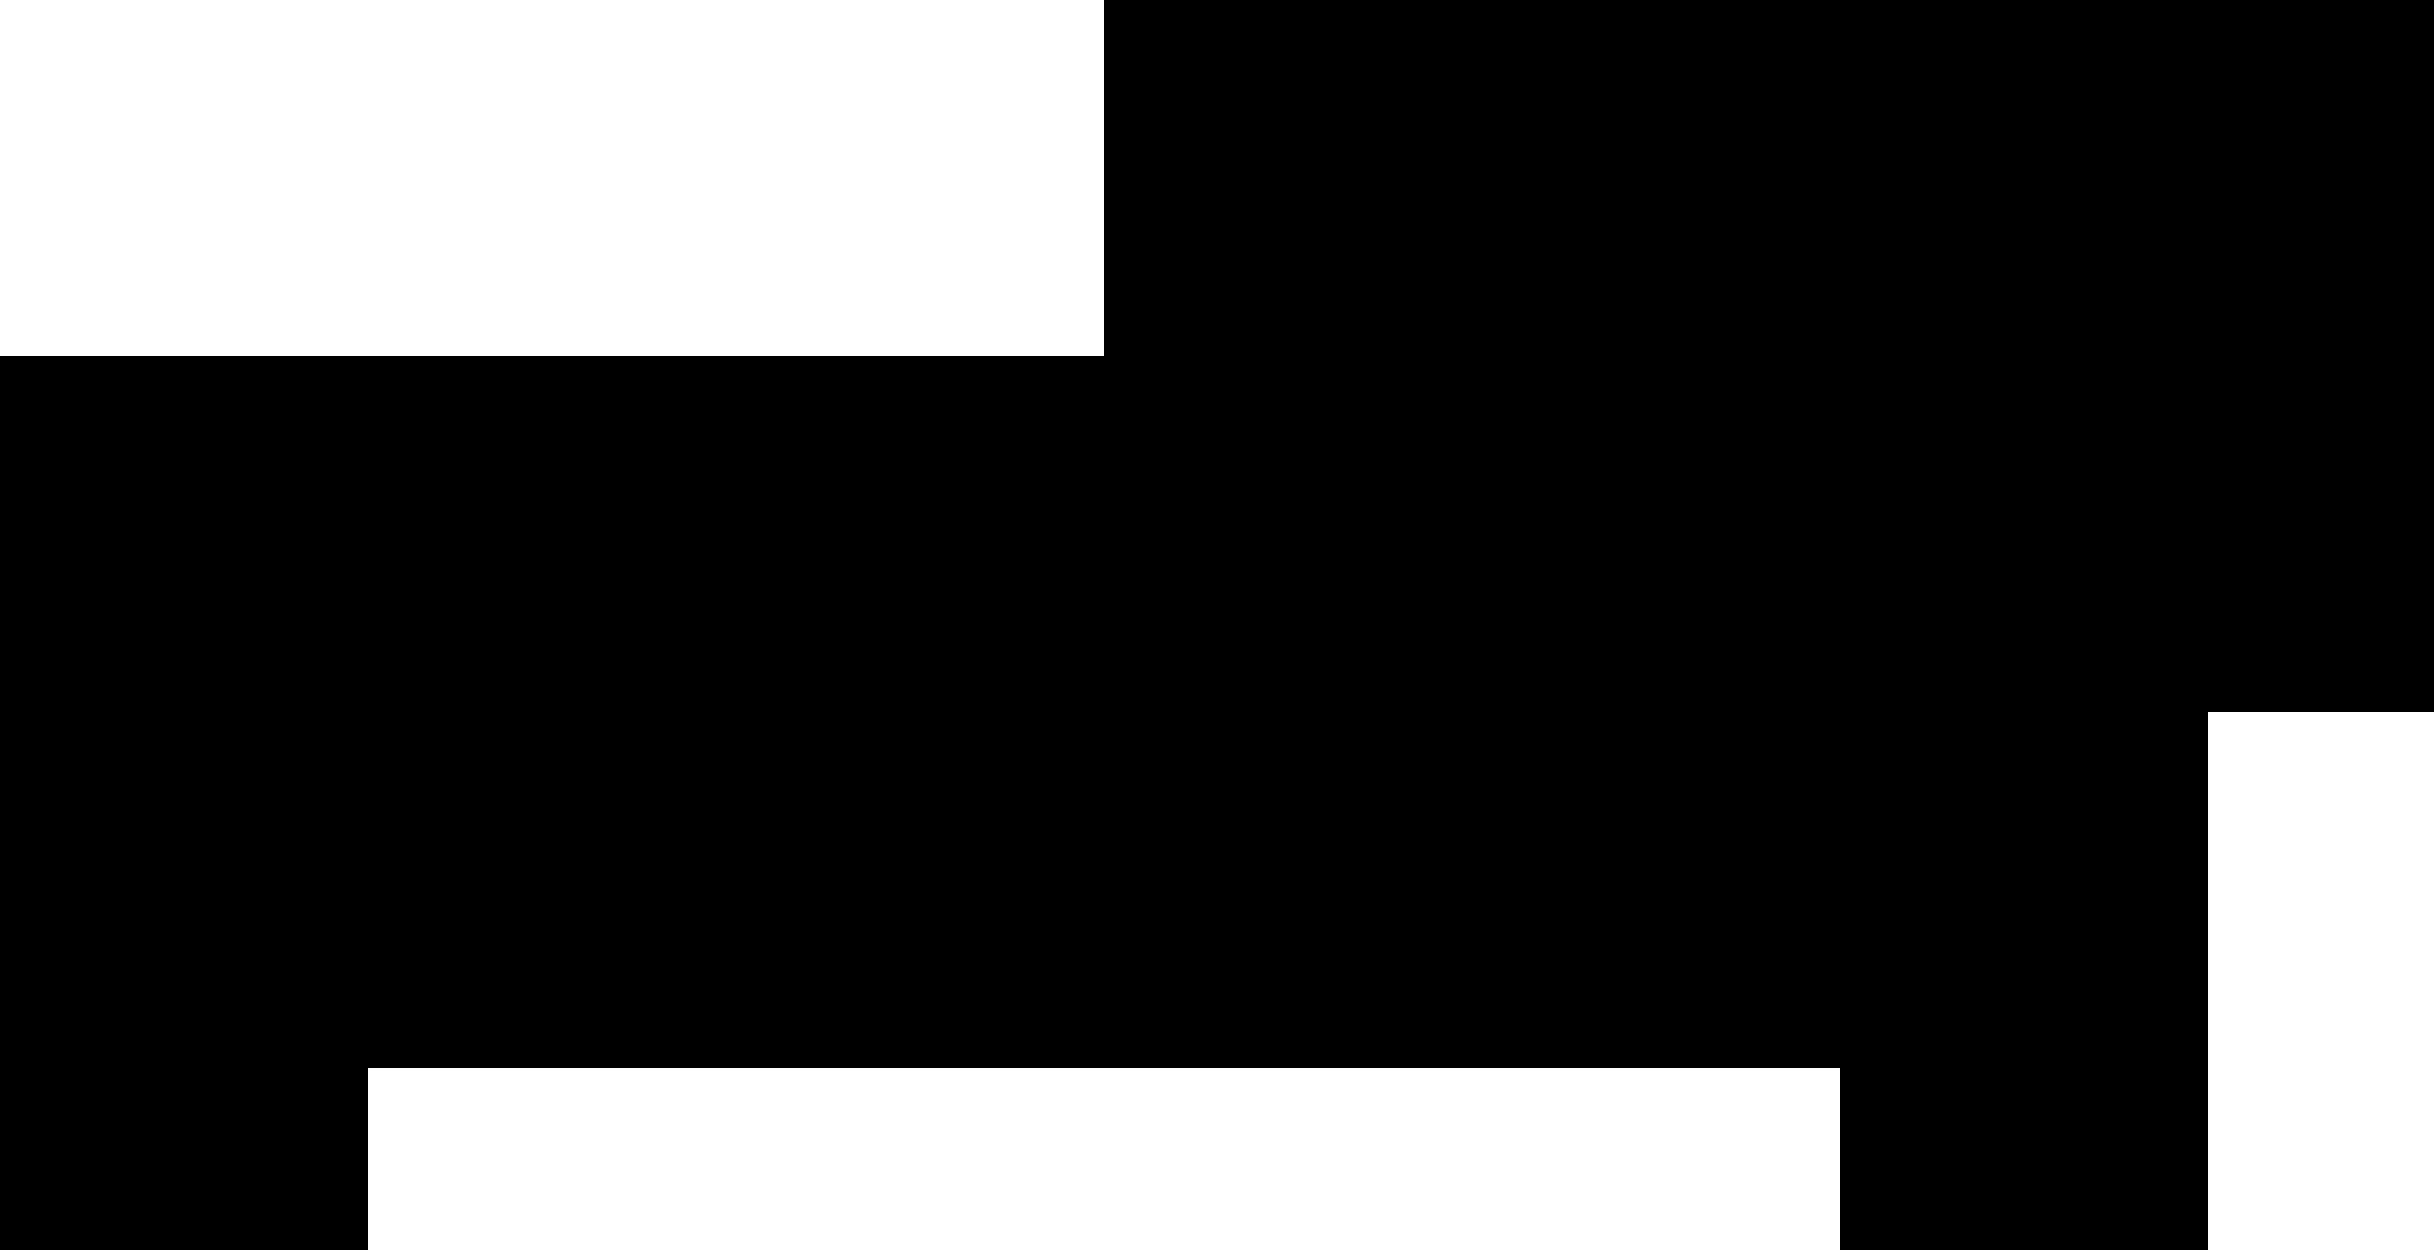 swoke sudeclope